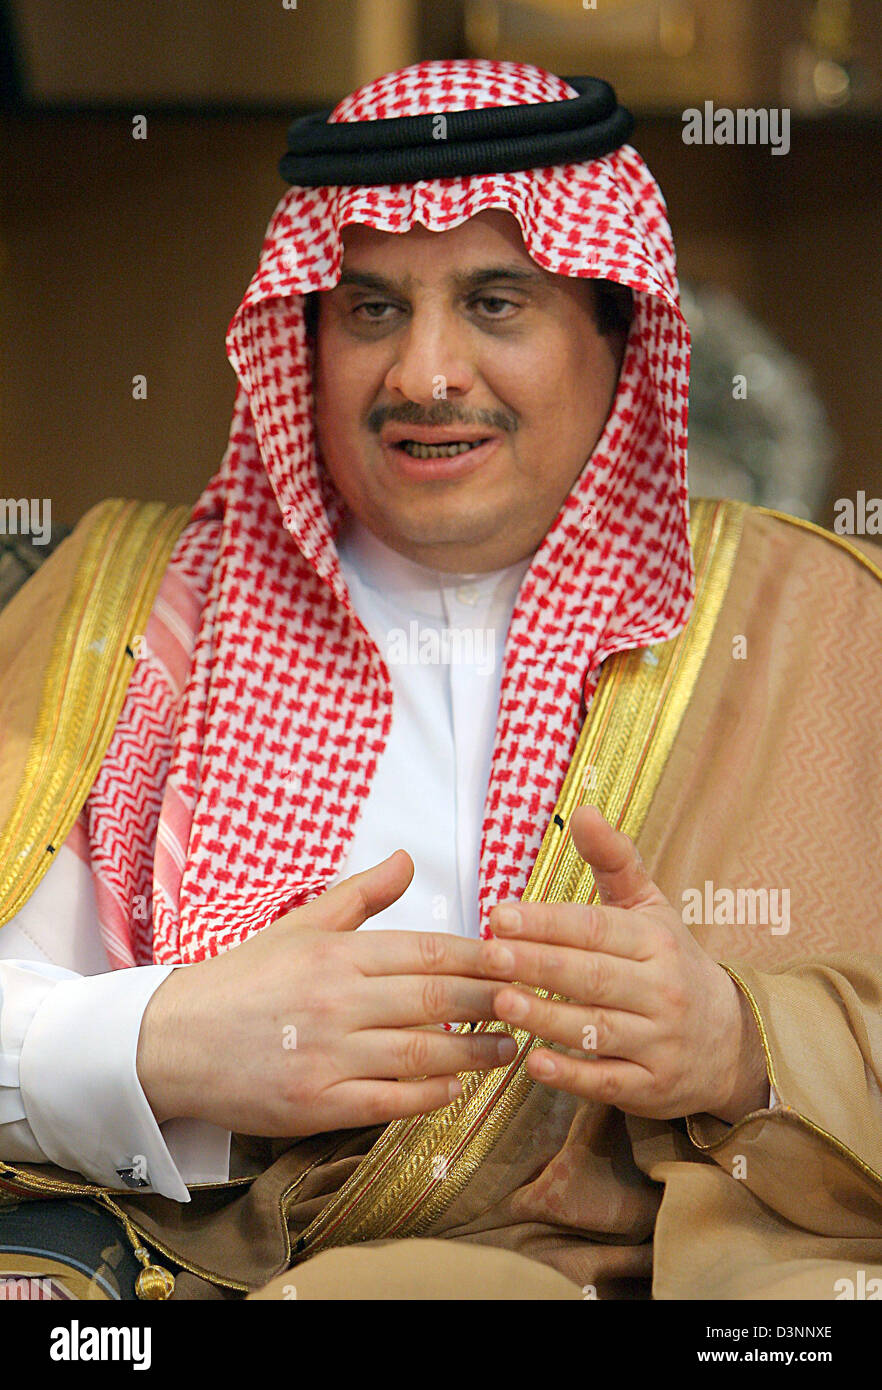 Saudi Prince Sultan Stock Photos & Saudi Prince Sultan Stock Images